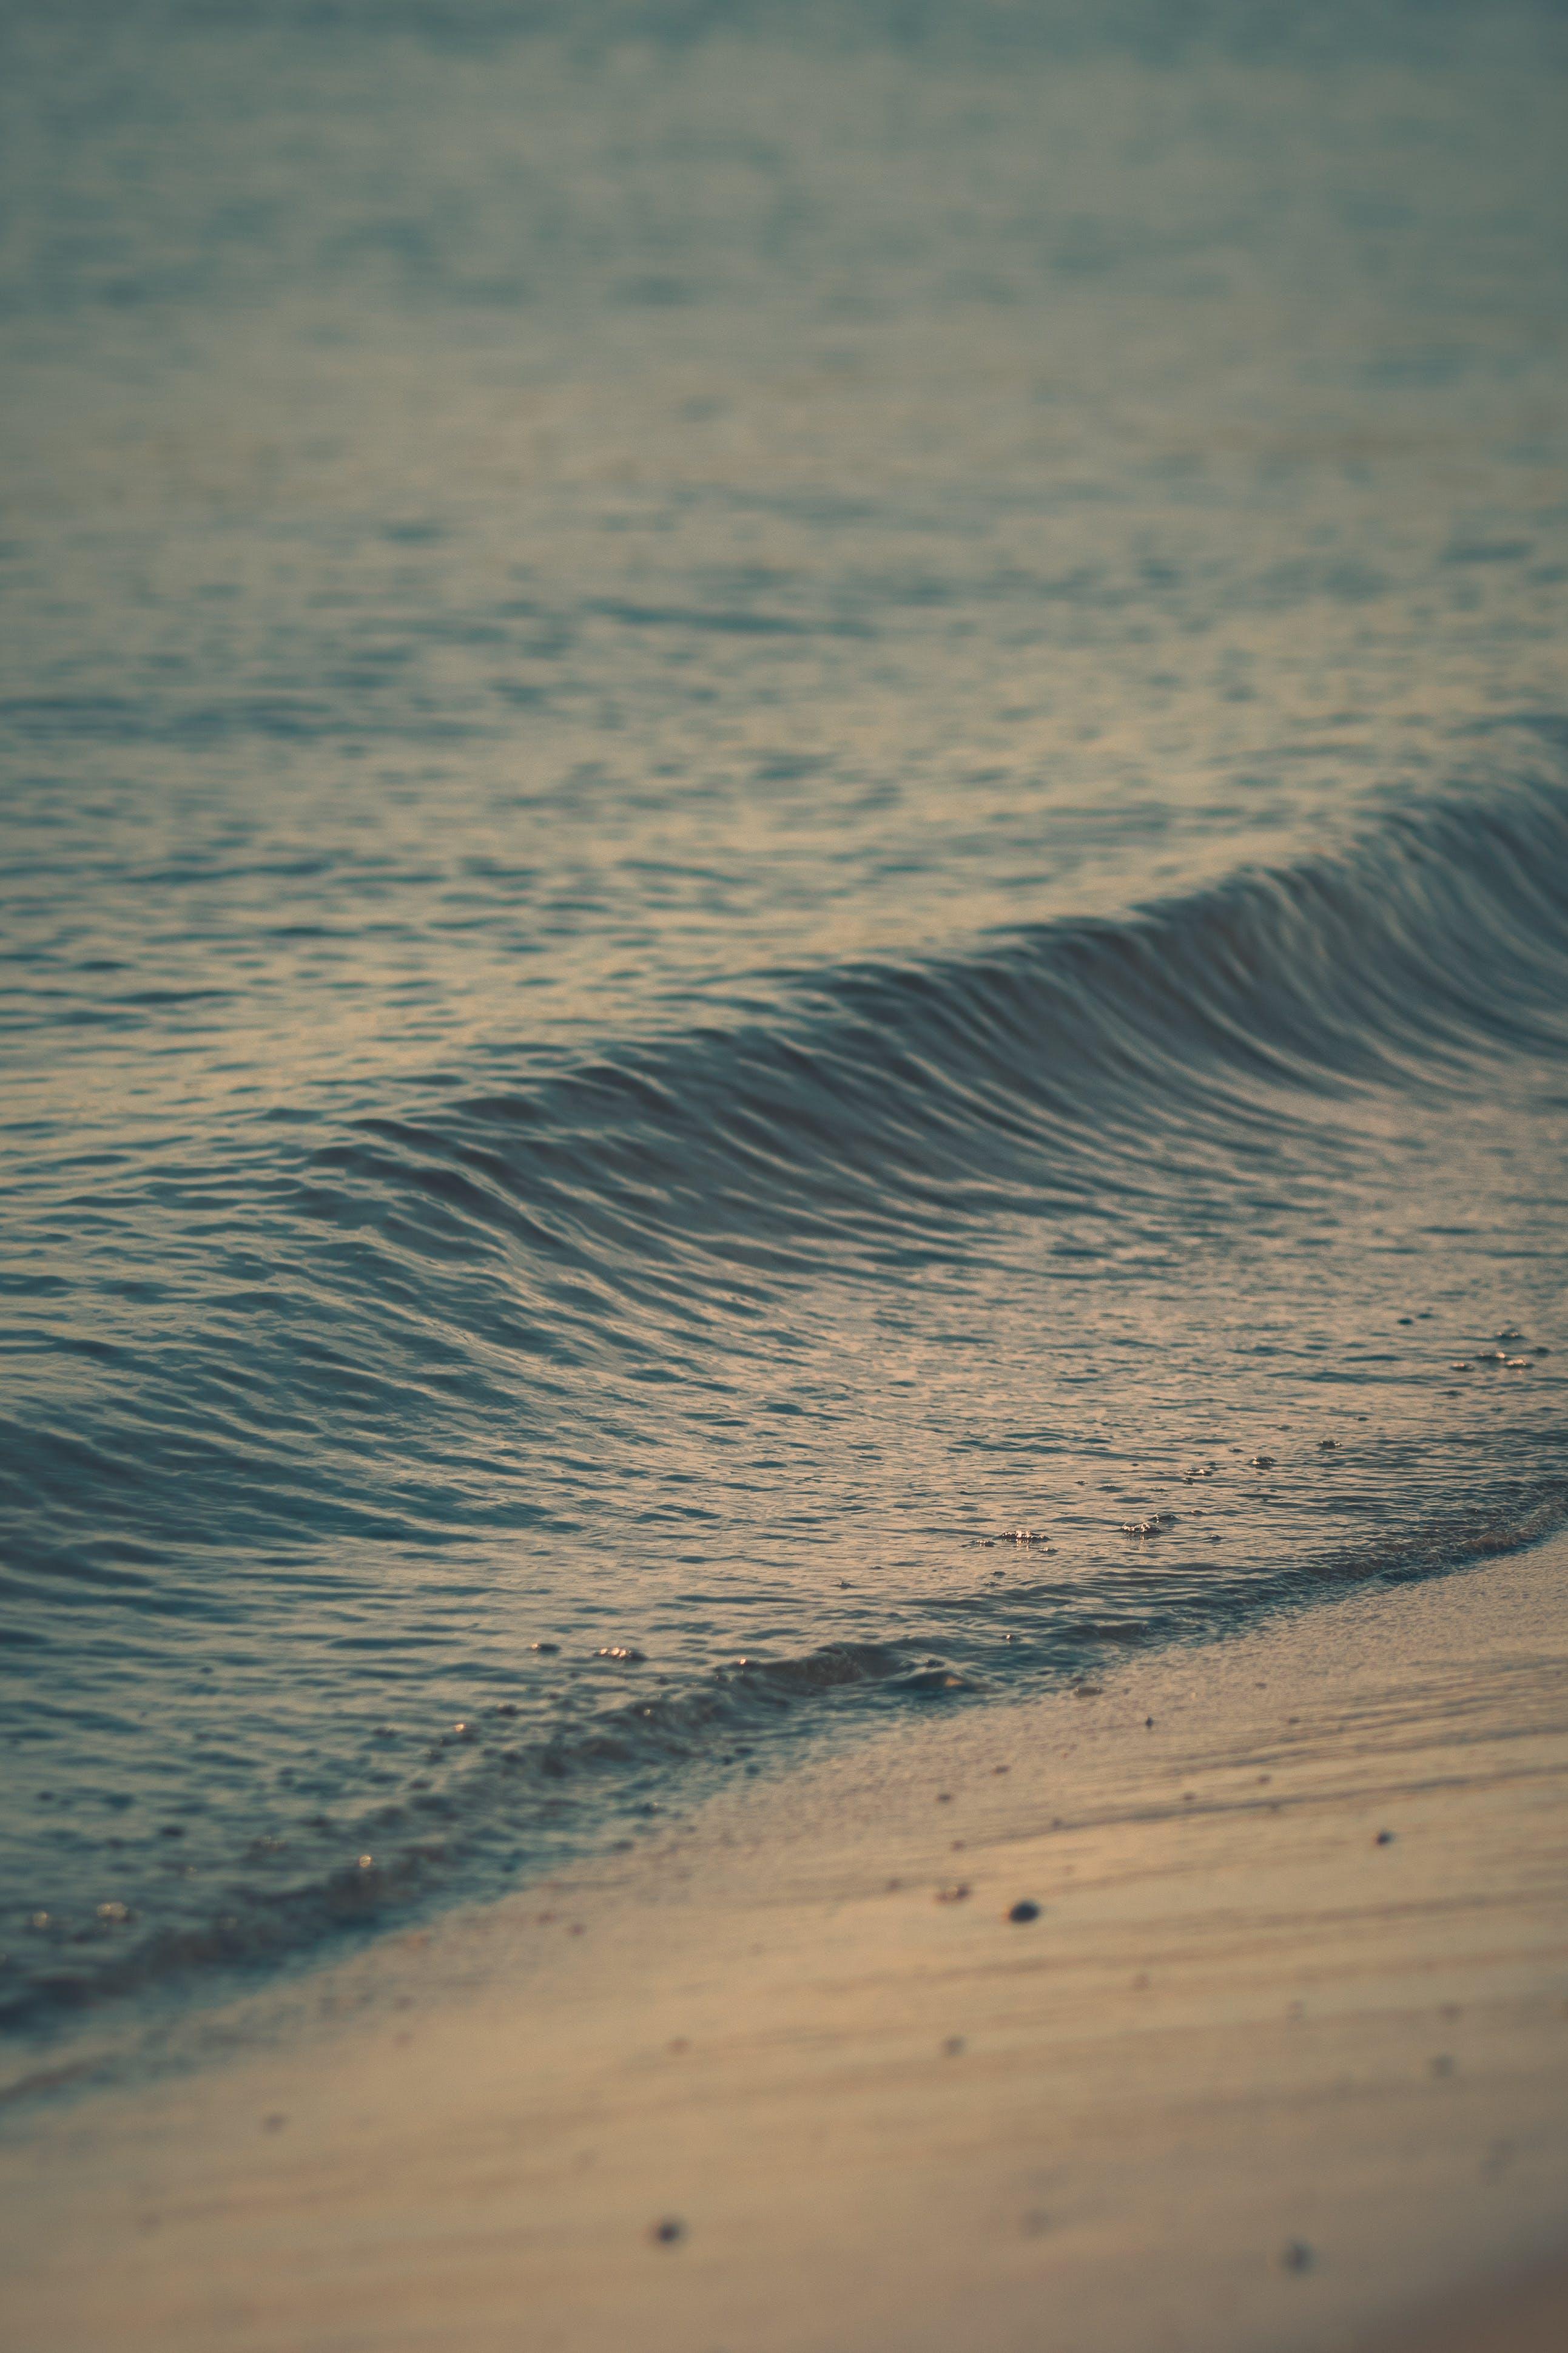 Free stock photo of android wallpaper, beach, iphone wallpaper, lake michigan